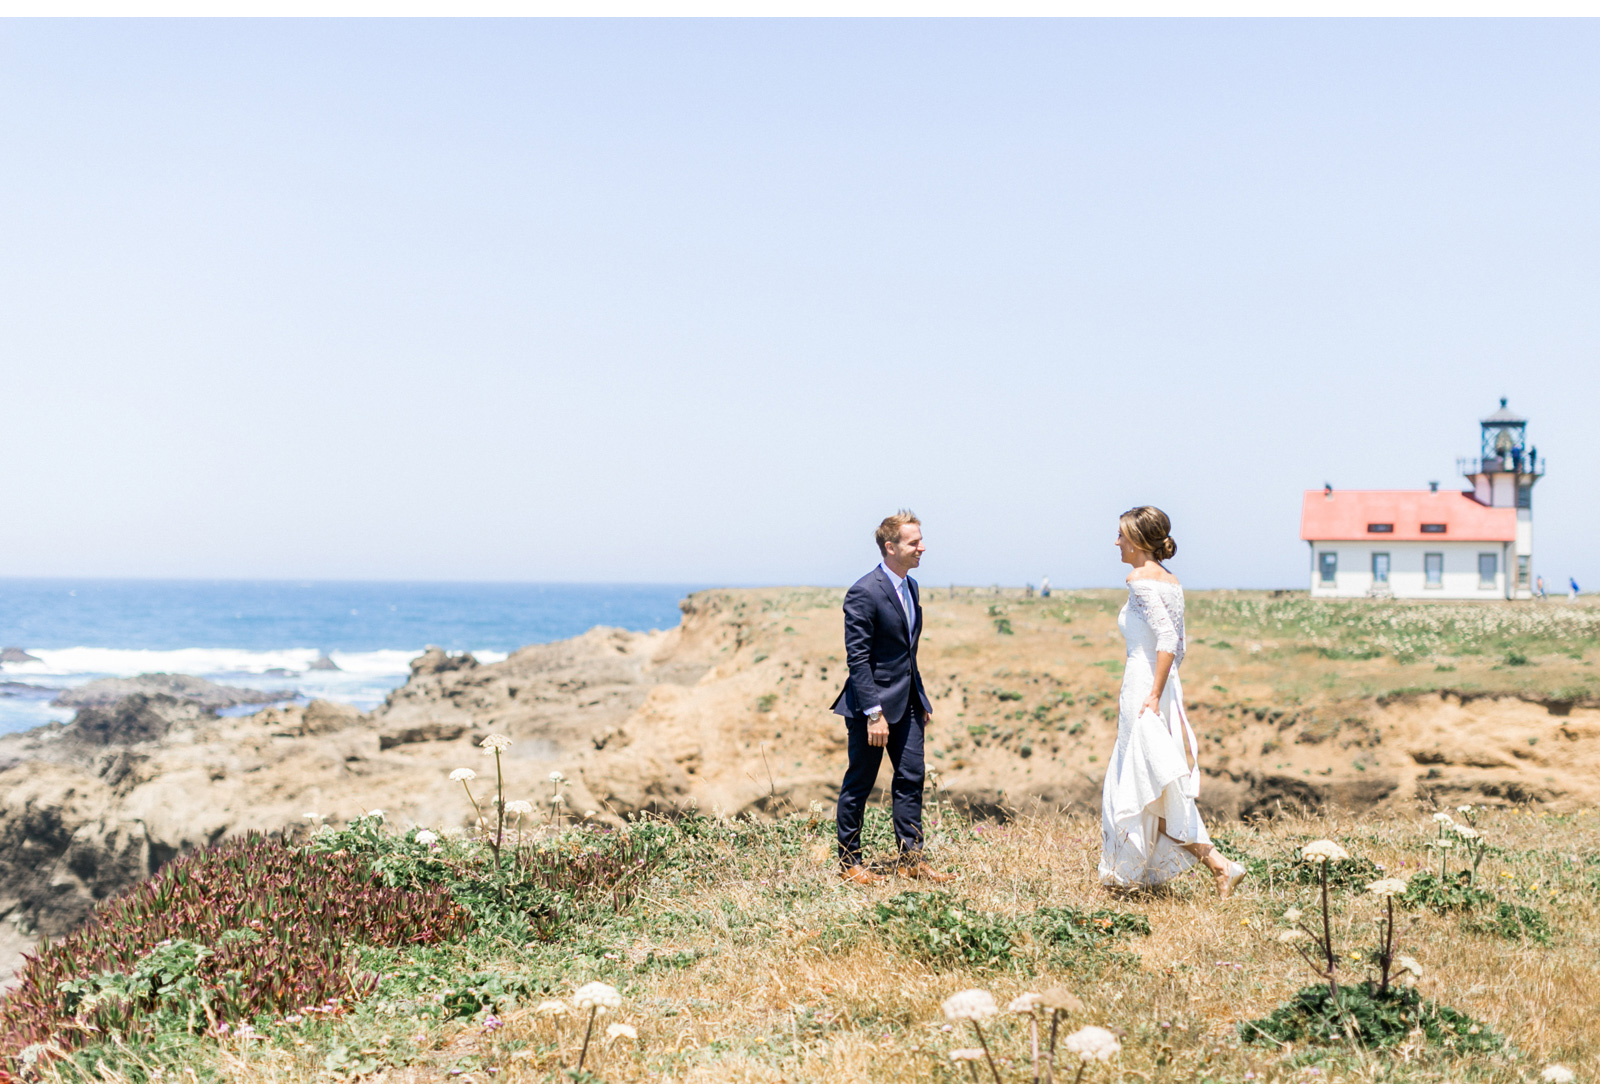 Mendocino-wedding-photographer-natalie-schutt-photography_08.jpg